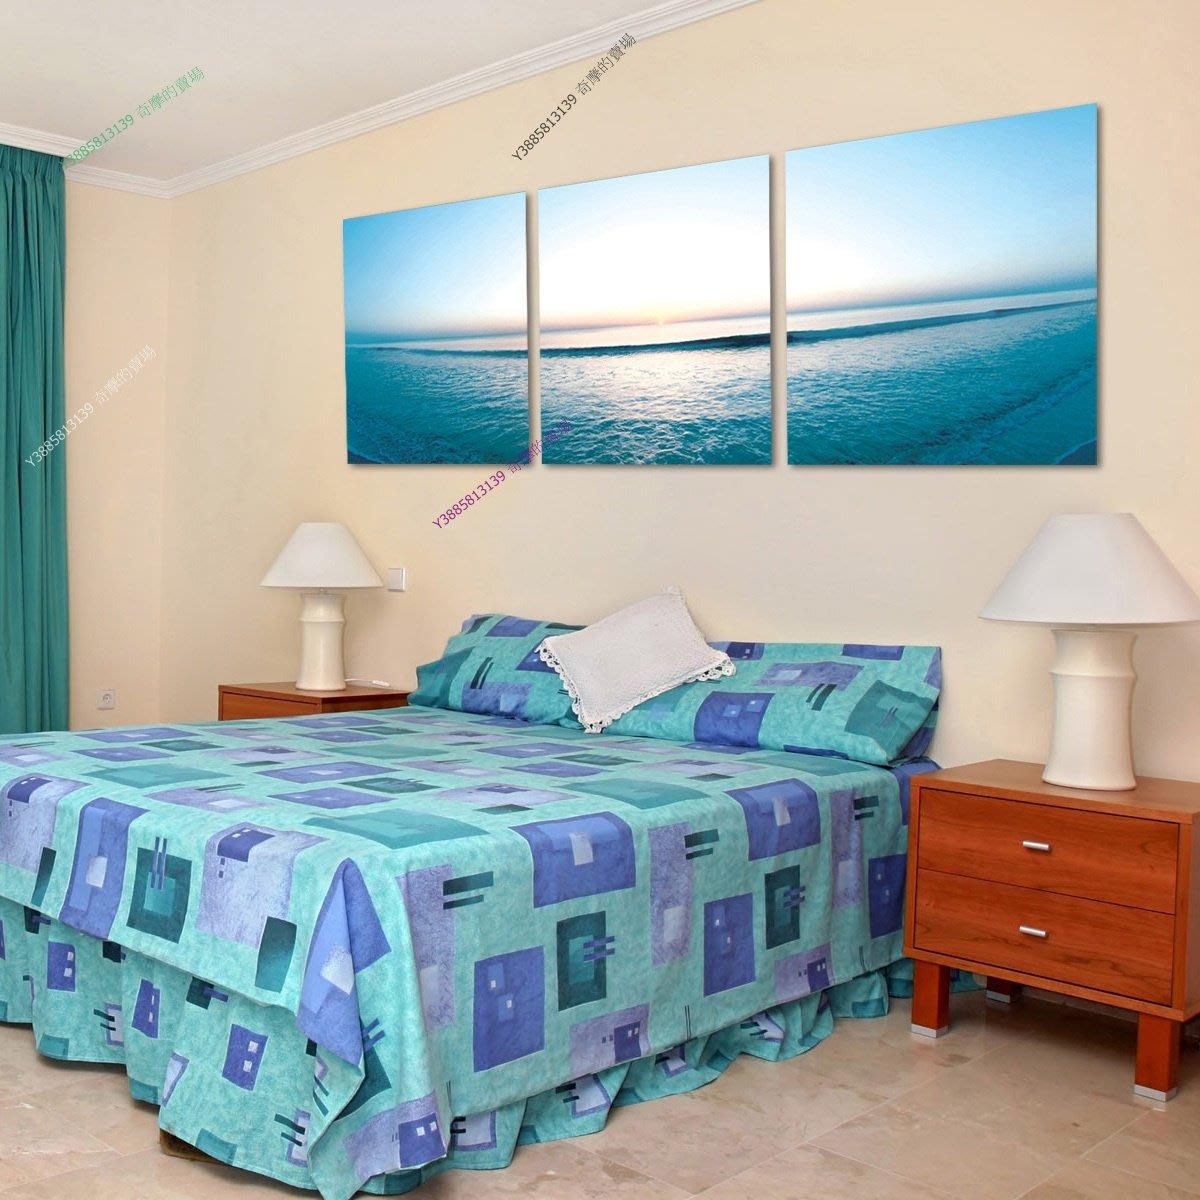 【40*40cm】【厚0.9cm】大海風景畫-無框畫裝飾畫版畫客廳簡約家居餐廳臥室【280101_425】(1套價格)